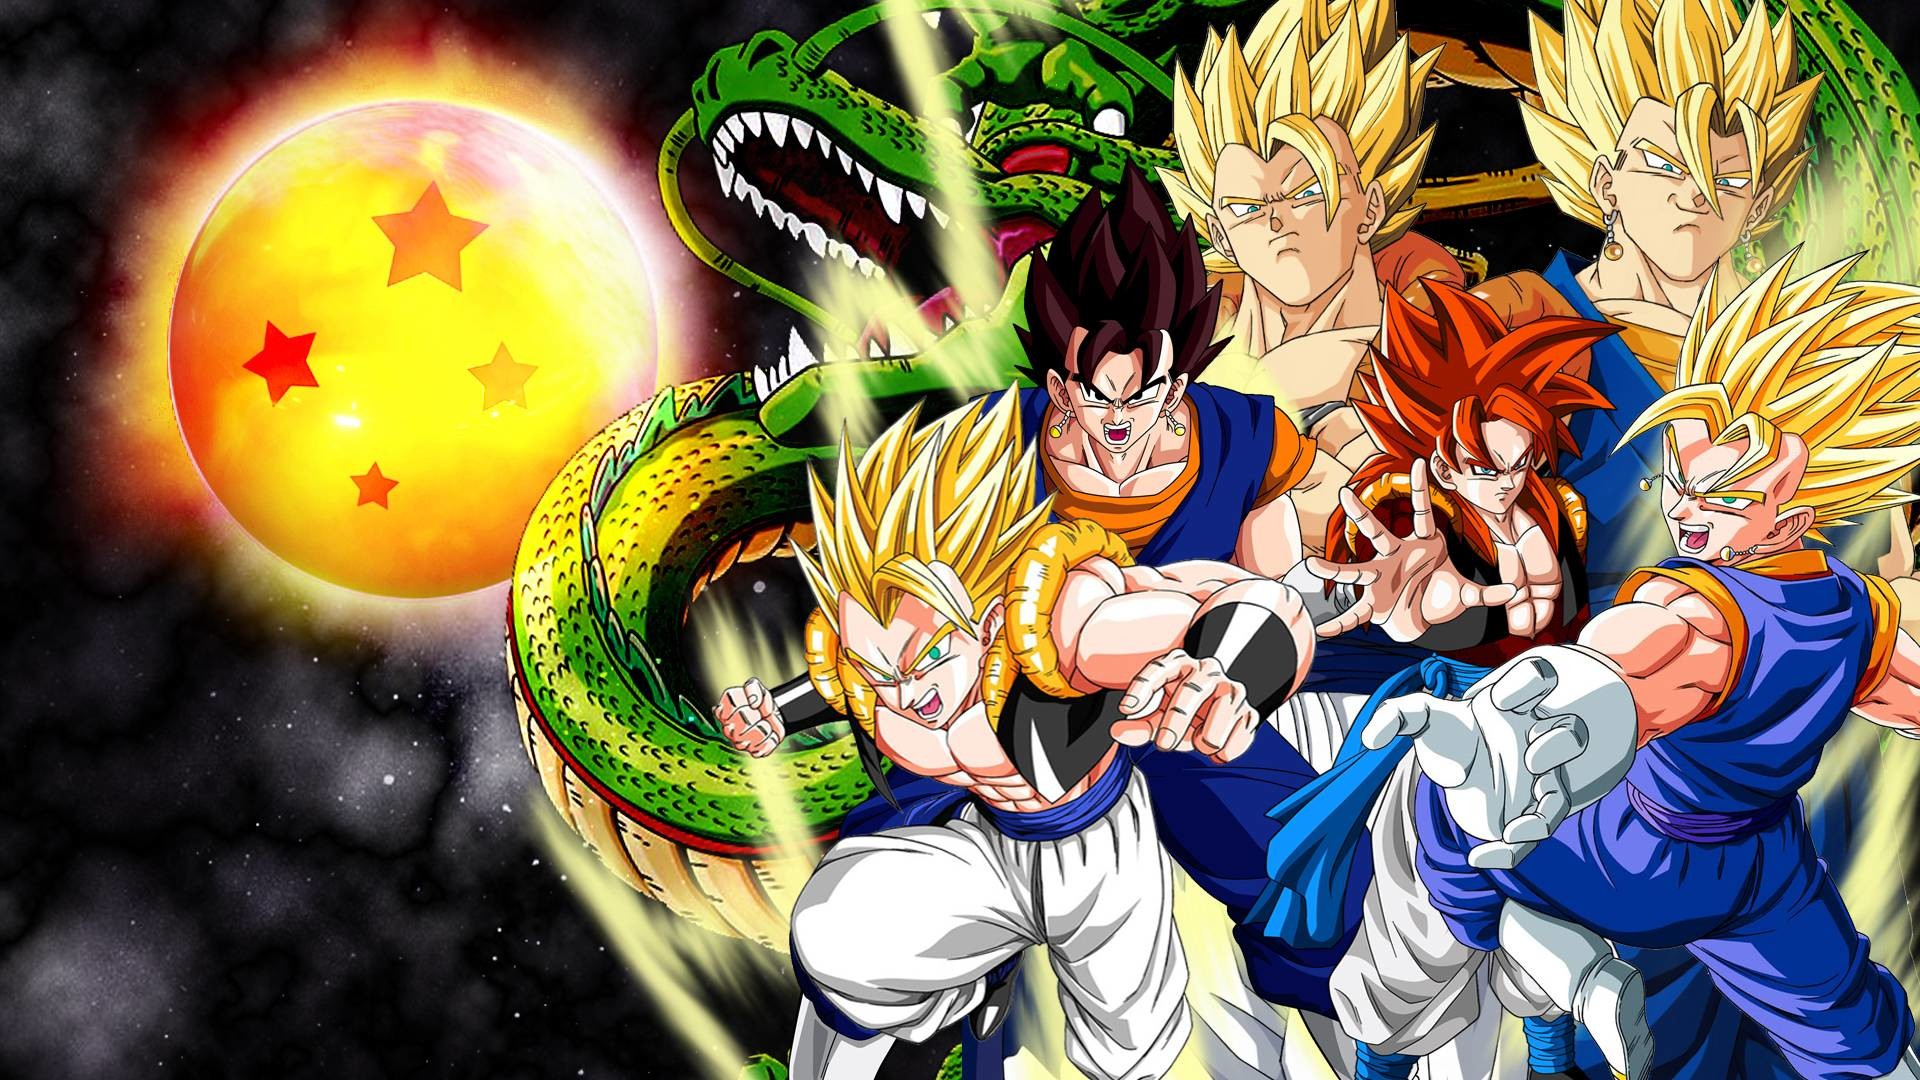 Dragon Ball Z Goku New Evolution Wallpaper HD #4471 Wallpaper .